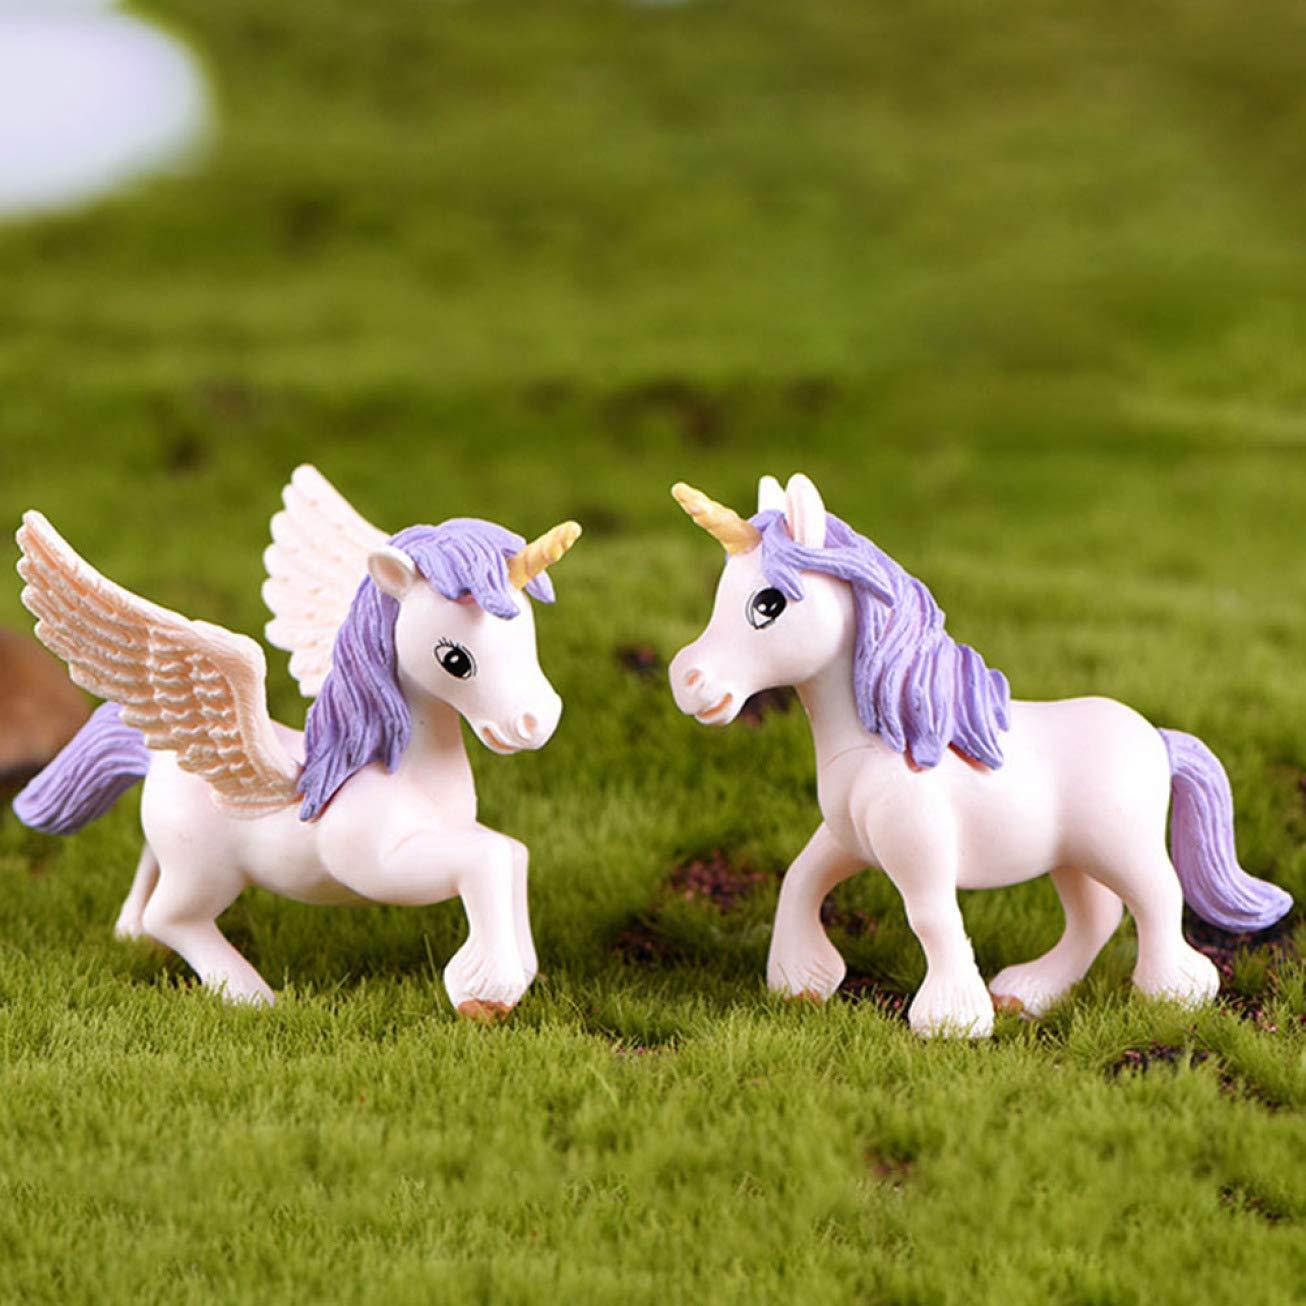 Izhiheng Zartes Einhorn Miniatur Deko Fliegendes Pferd Kunststoff Basteln Ornamente Wingless